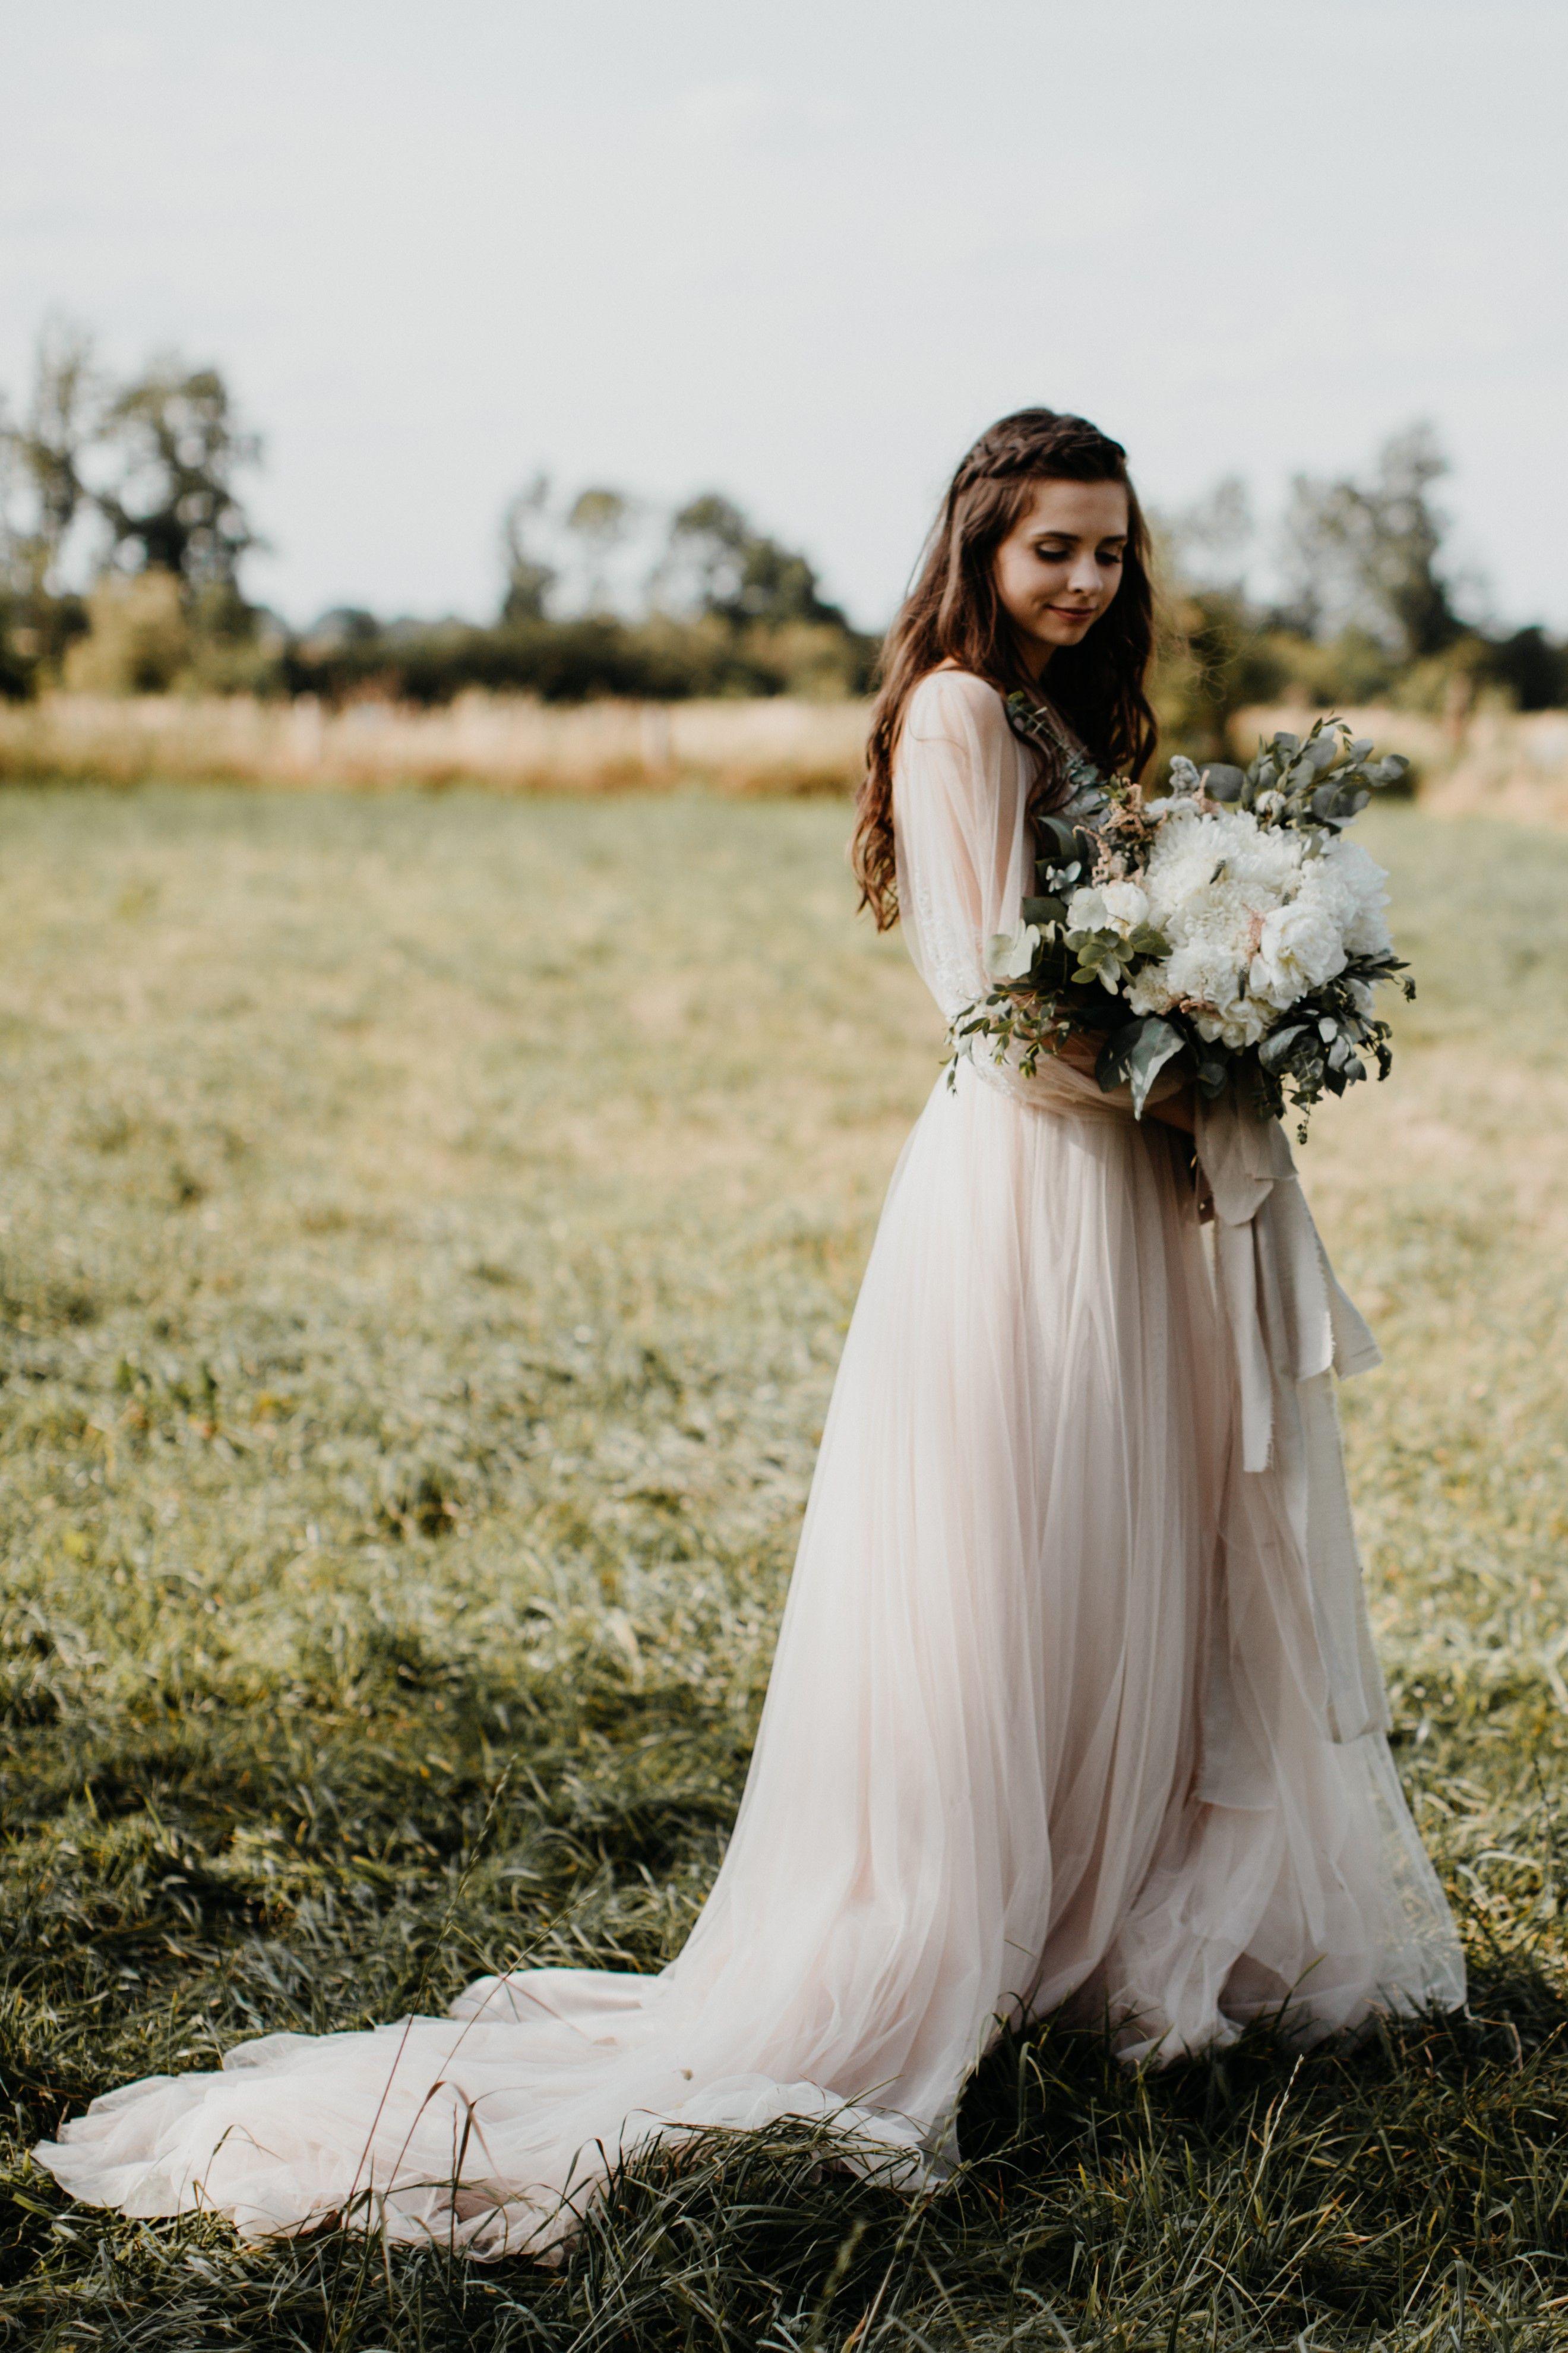 Country Wedding Boho Style With Iayrealbride Elli Hochzeit I Kleid